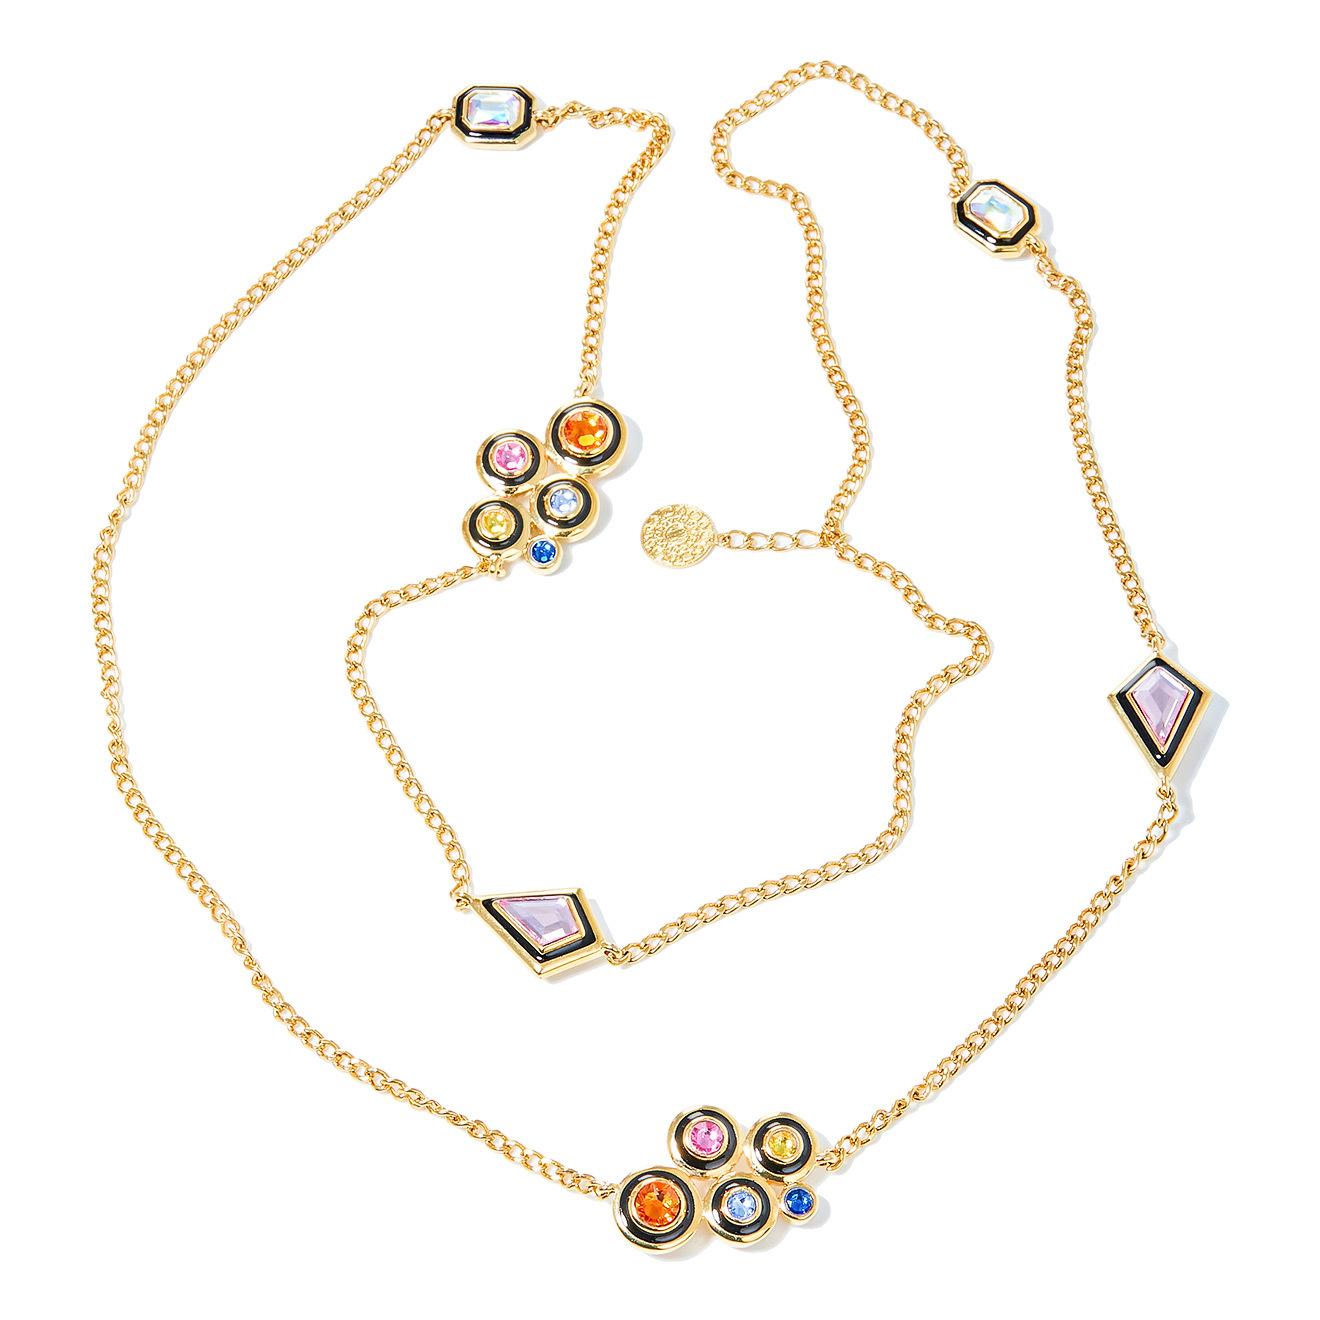 Isharya Позолоченный сотуар с кристаллами